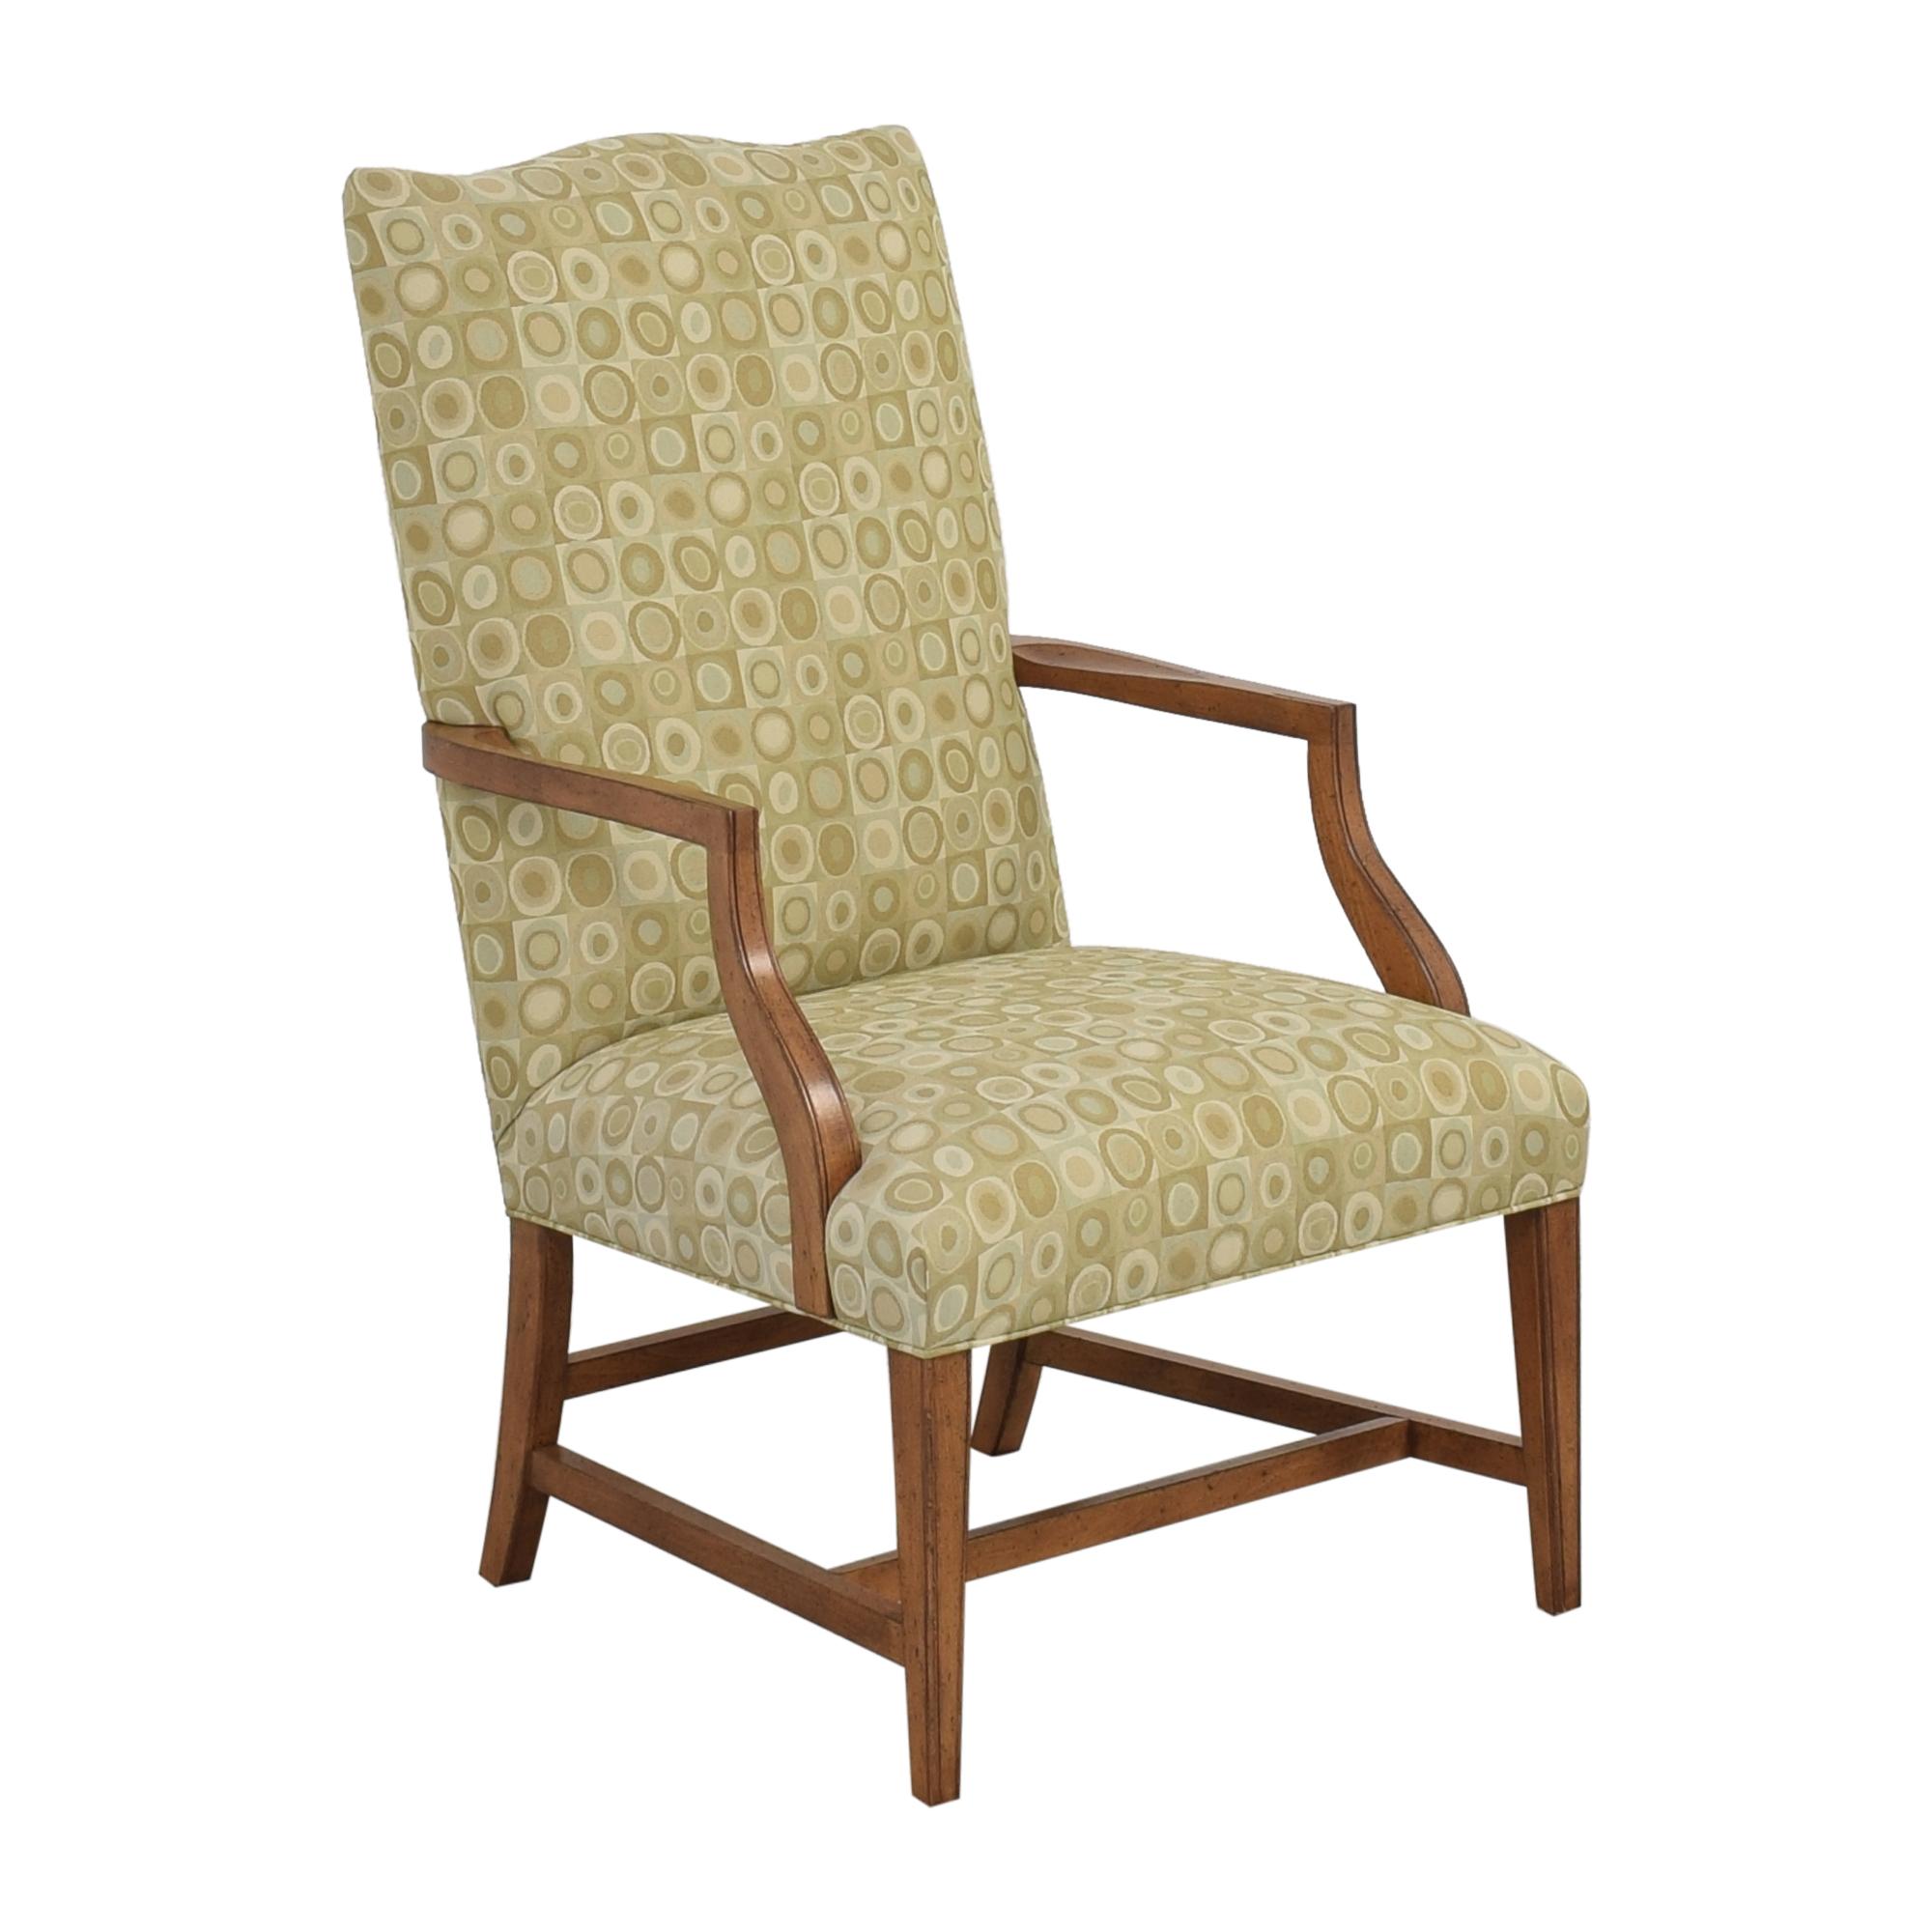 Ethan Allen Ethan Allen Accent Chair nyc